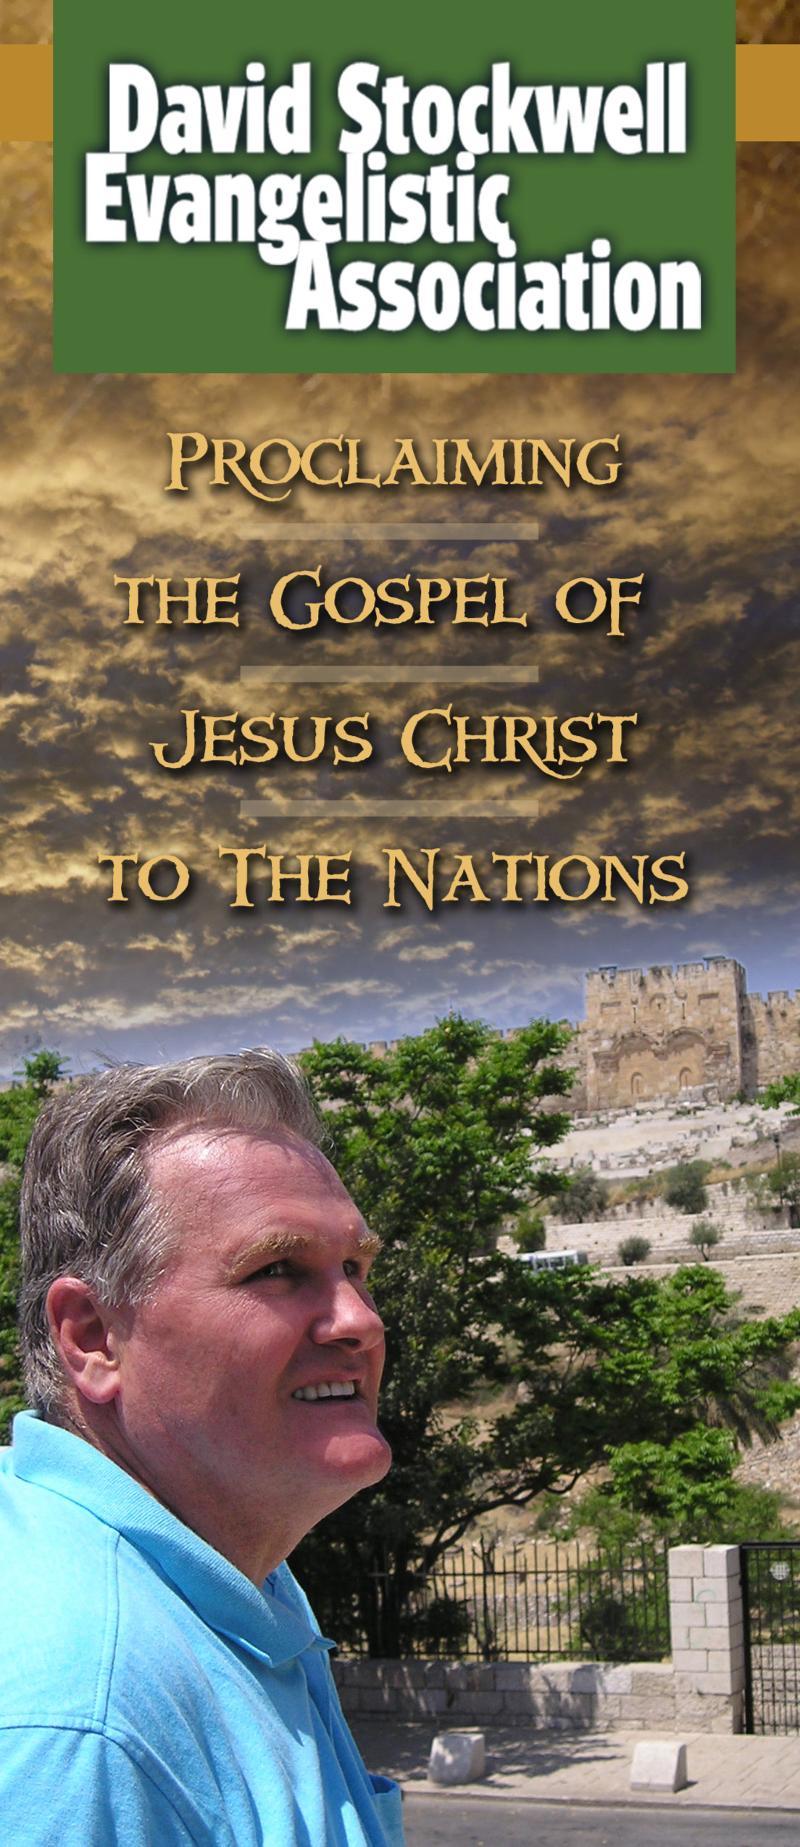 David Stockwell Evangelistic Association